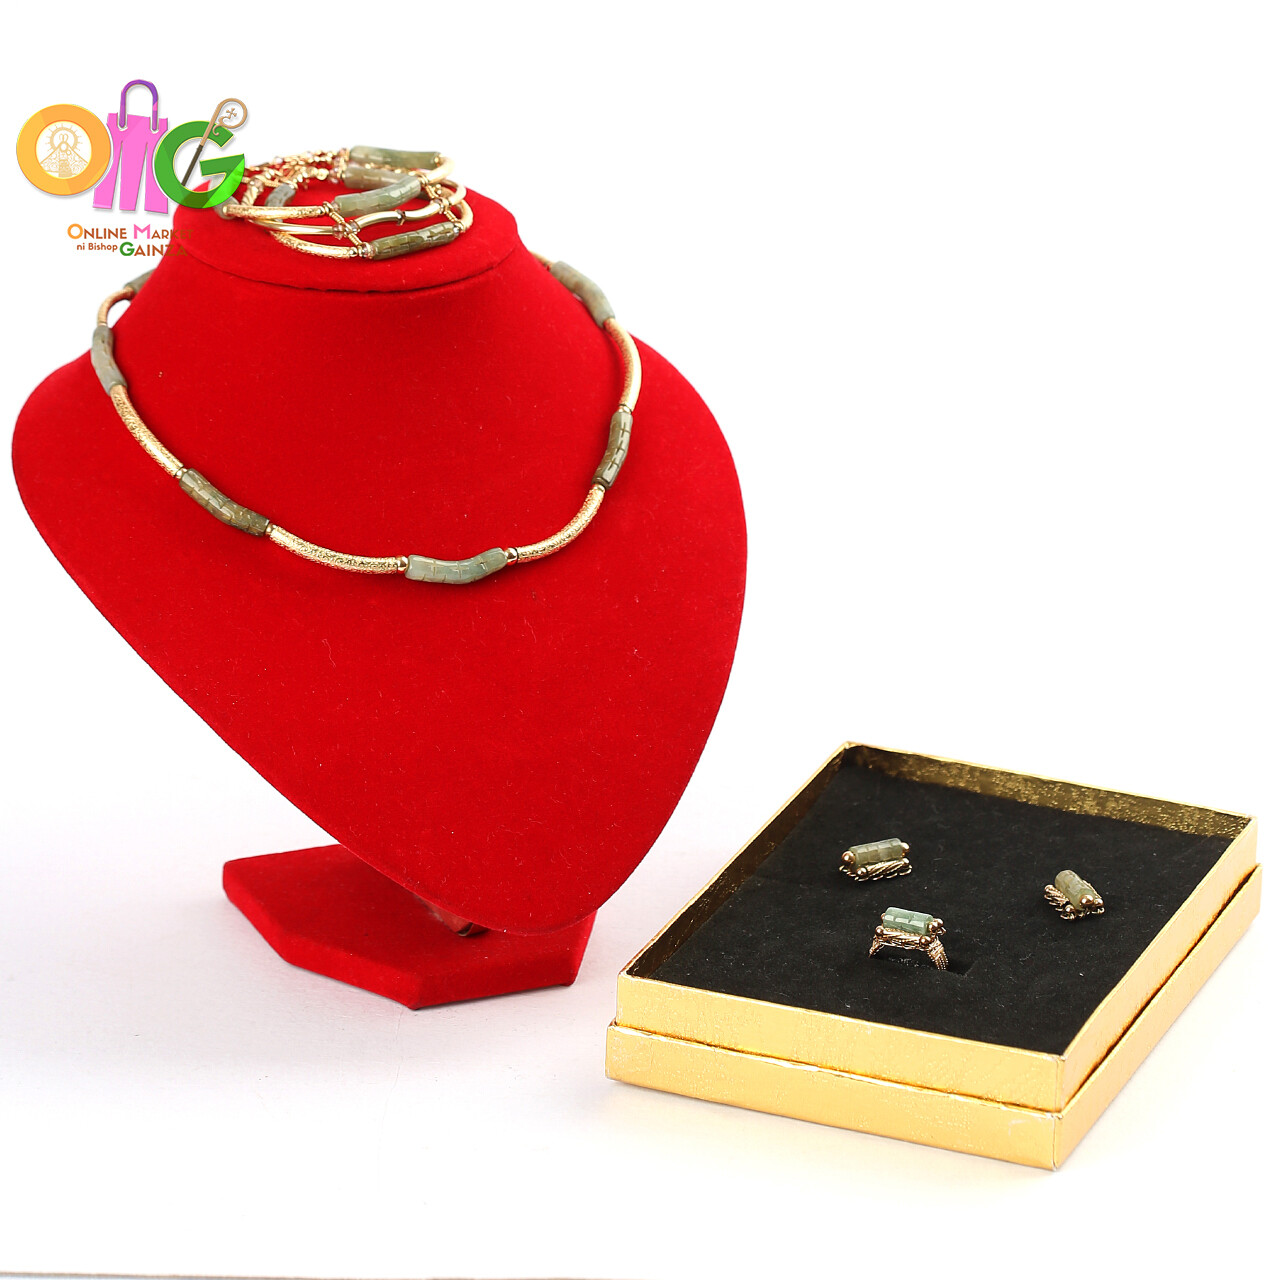 Giwuav Jewelry Creations - Julienne